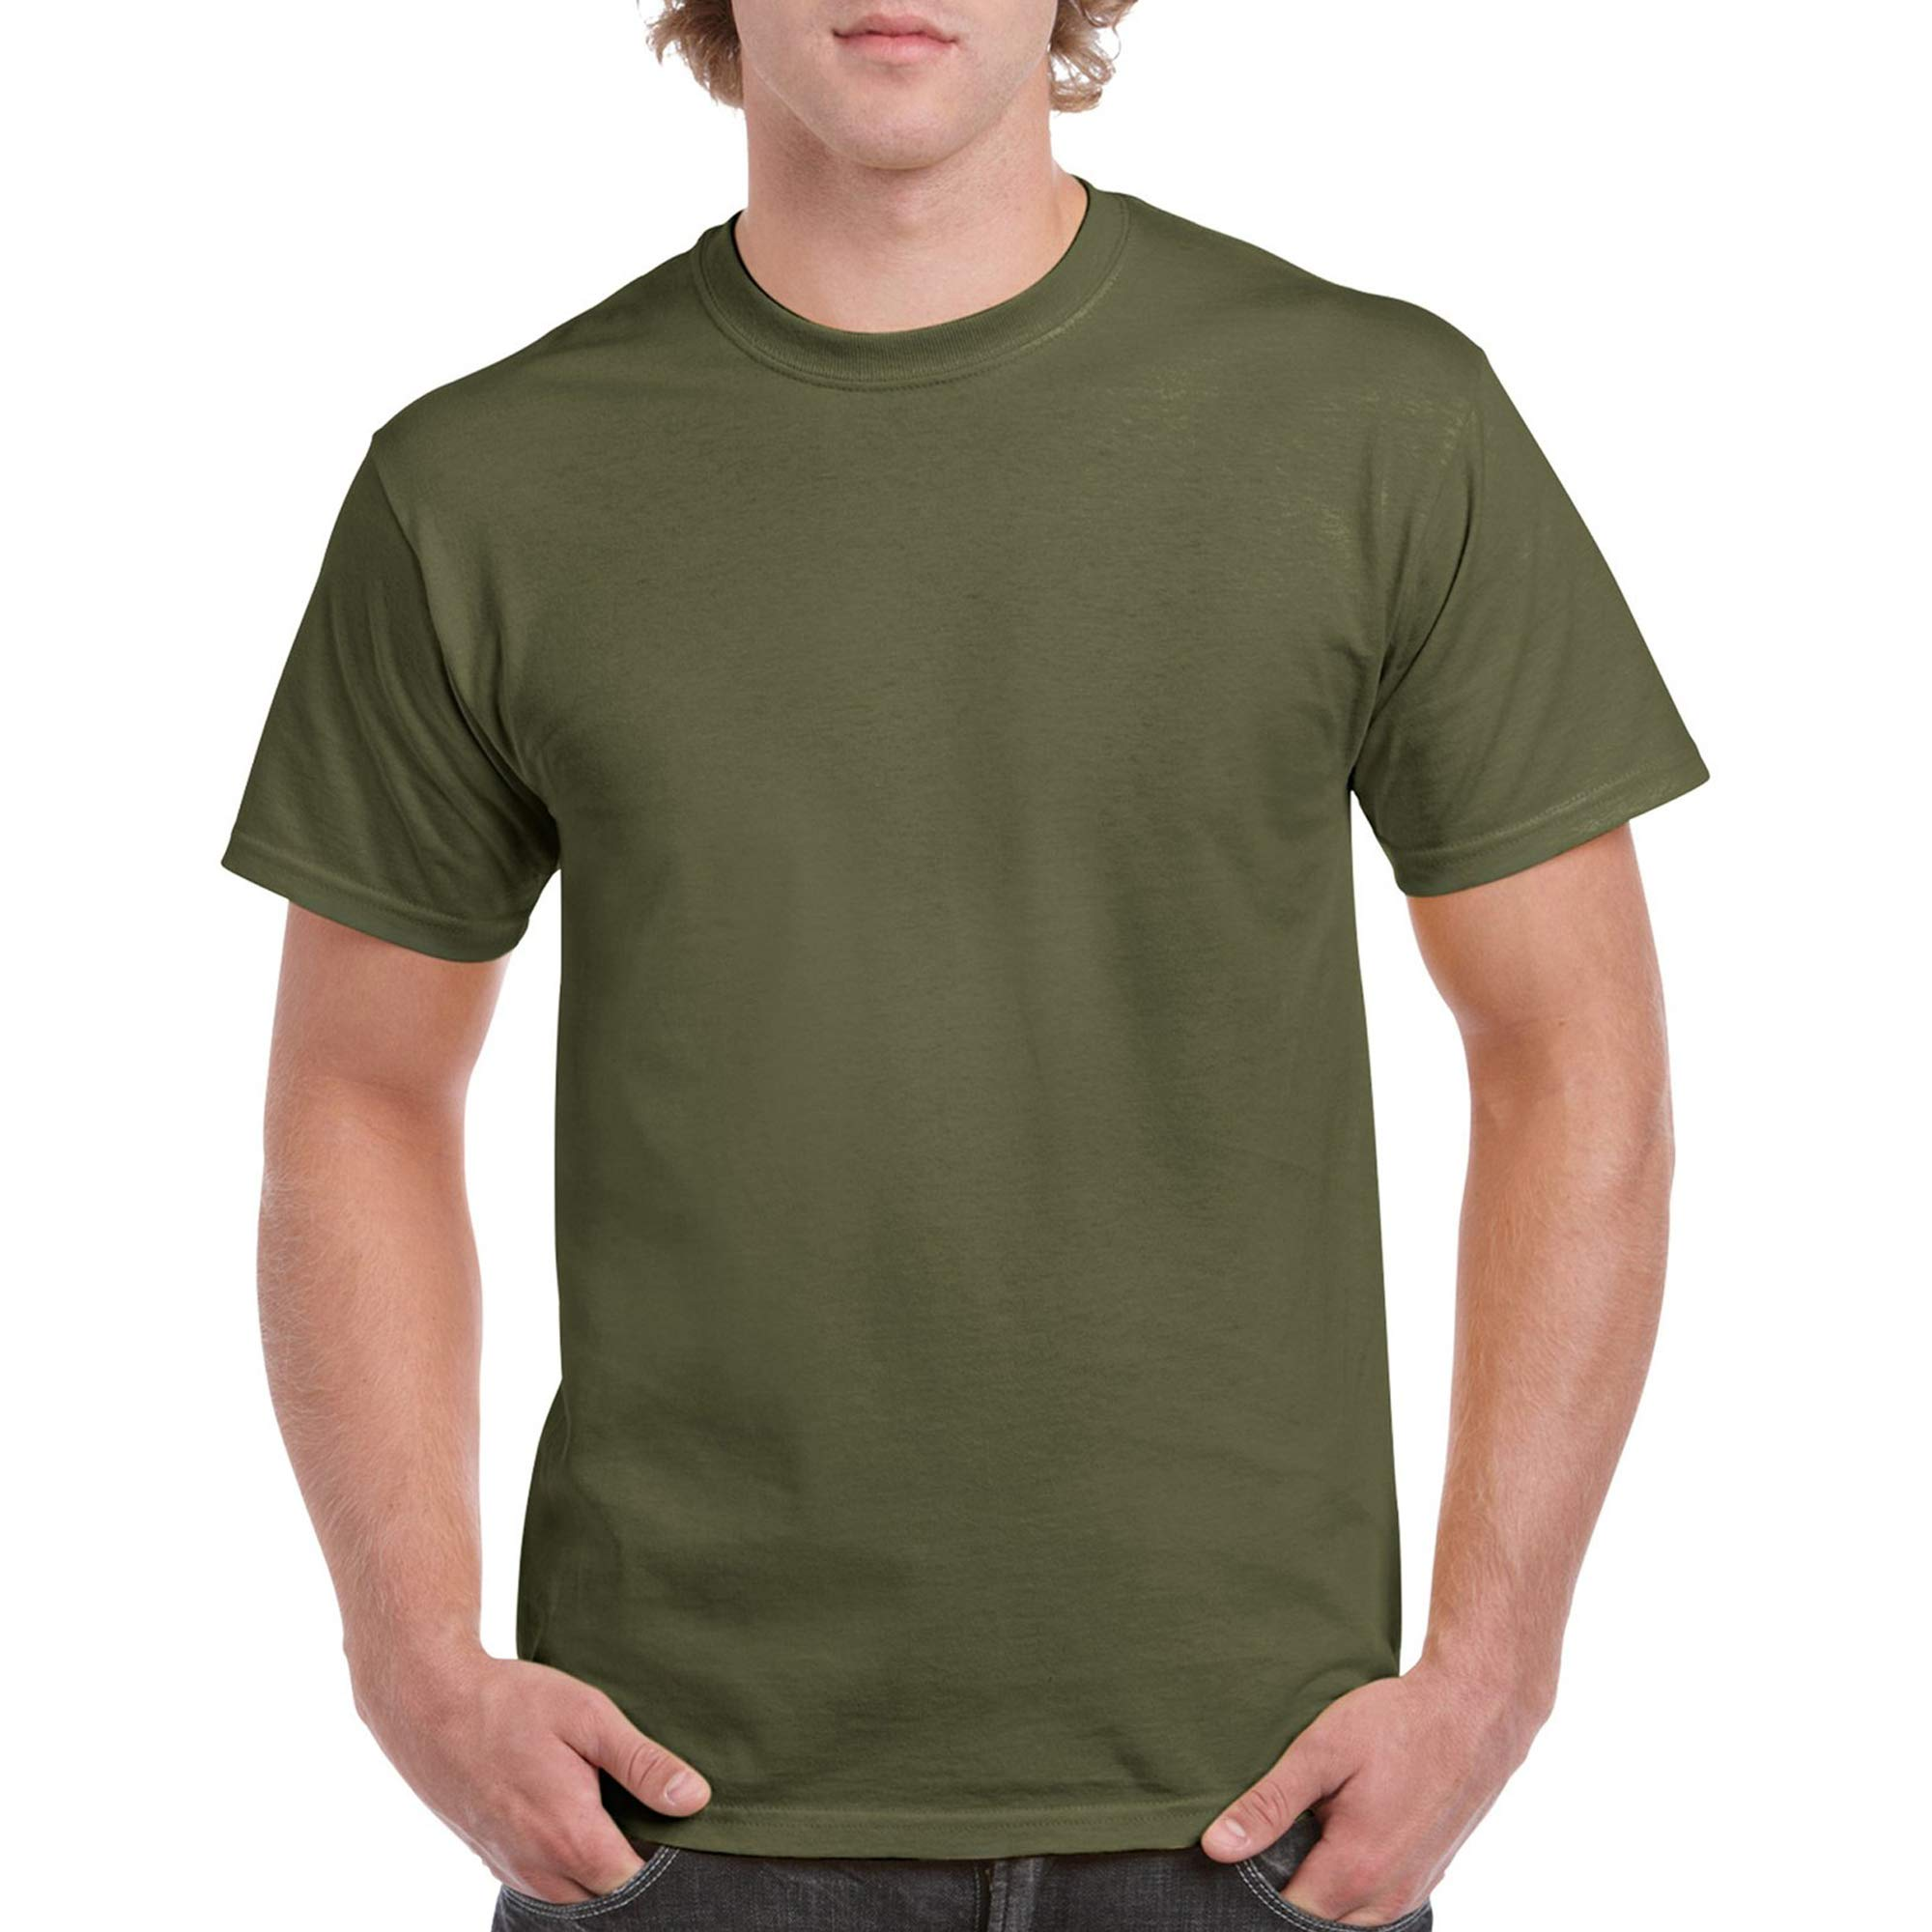 Men's Shirt (Pack of 2)